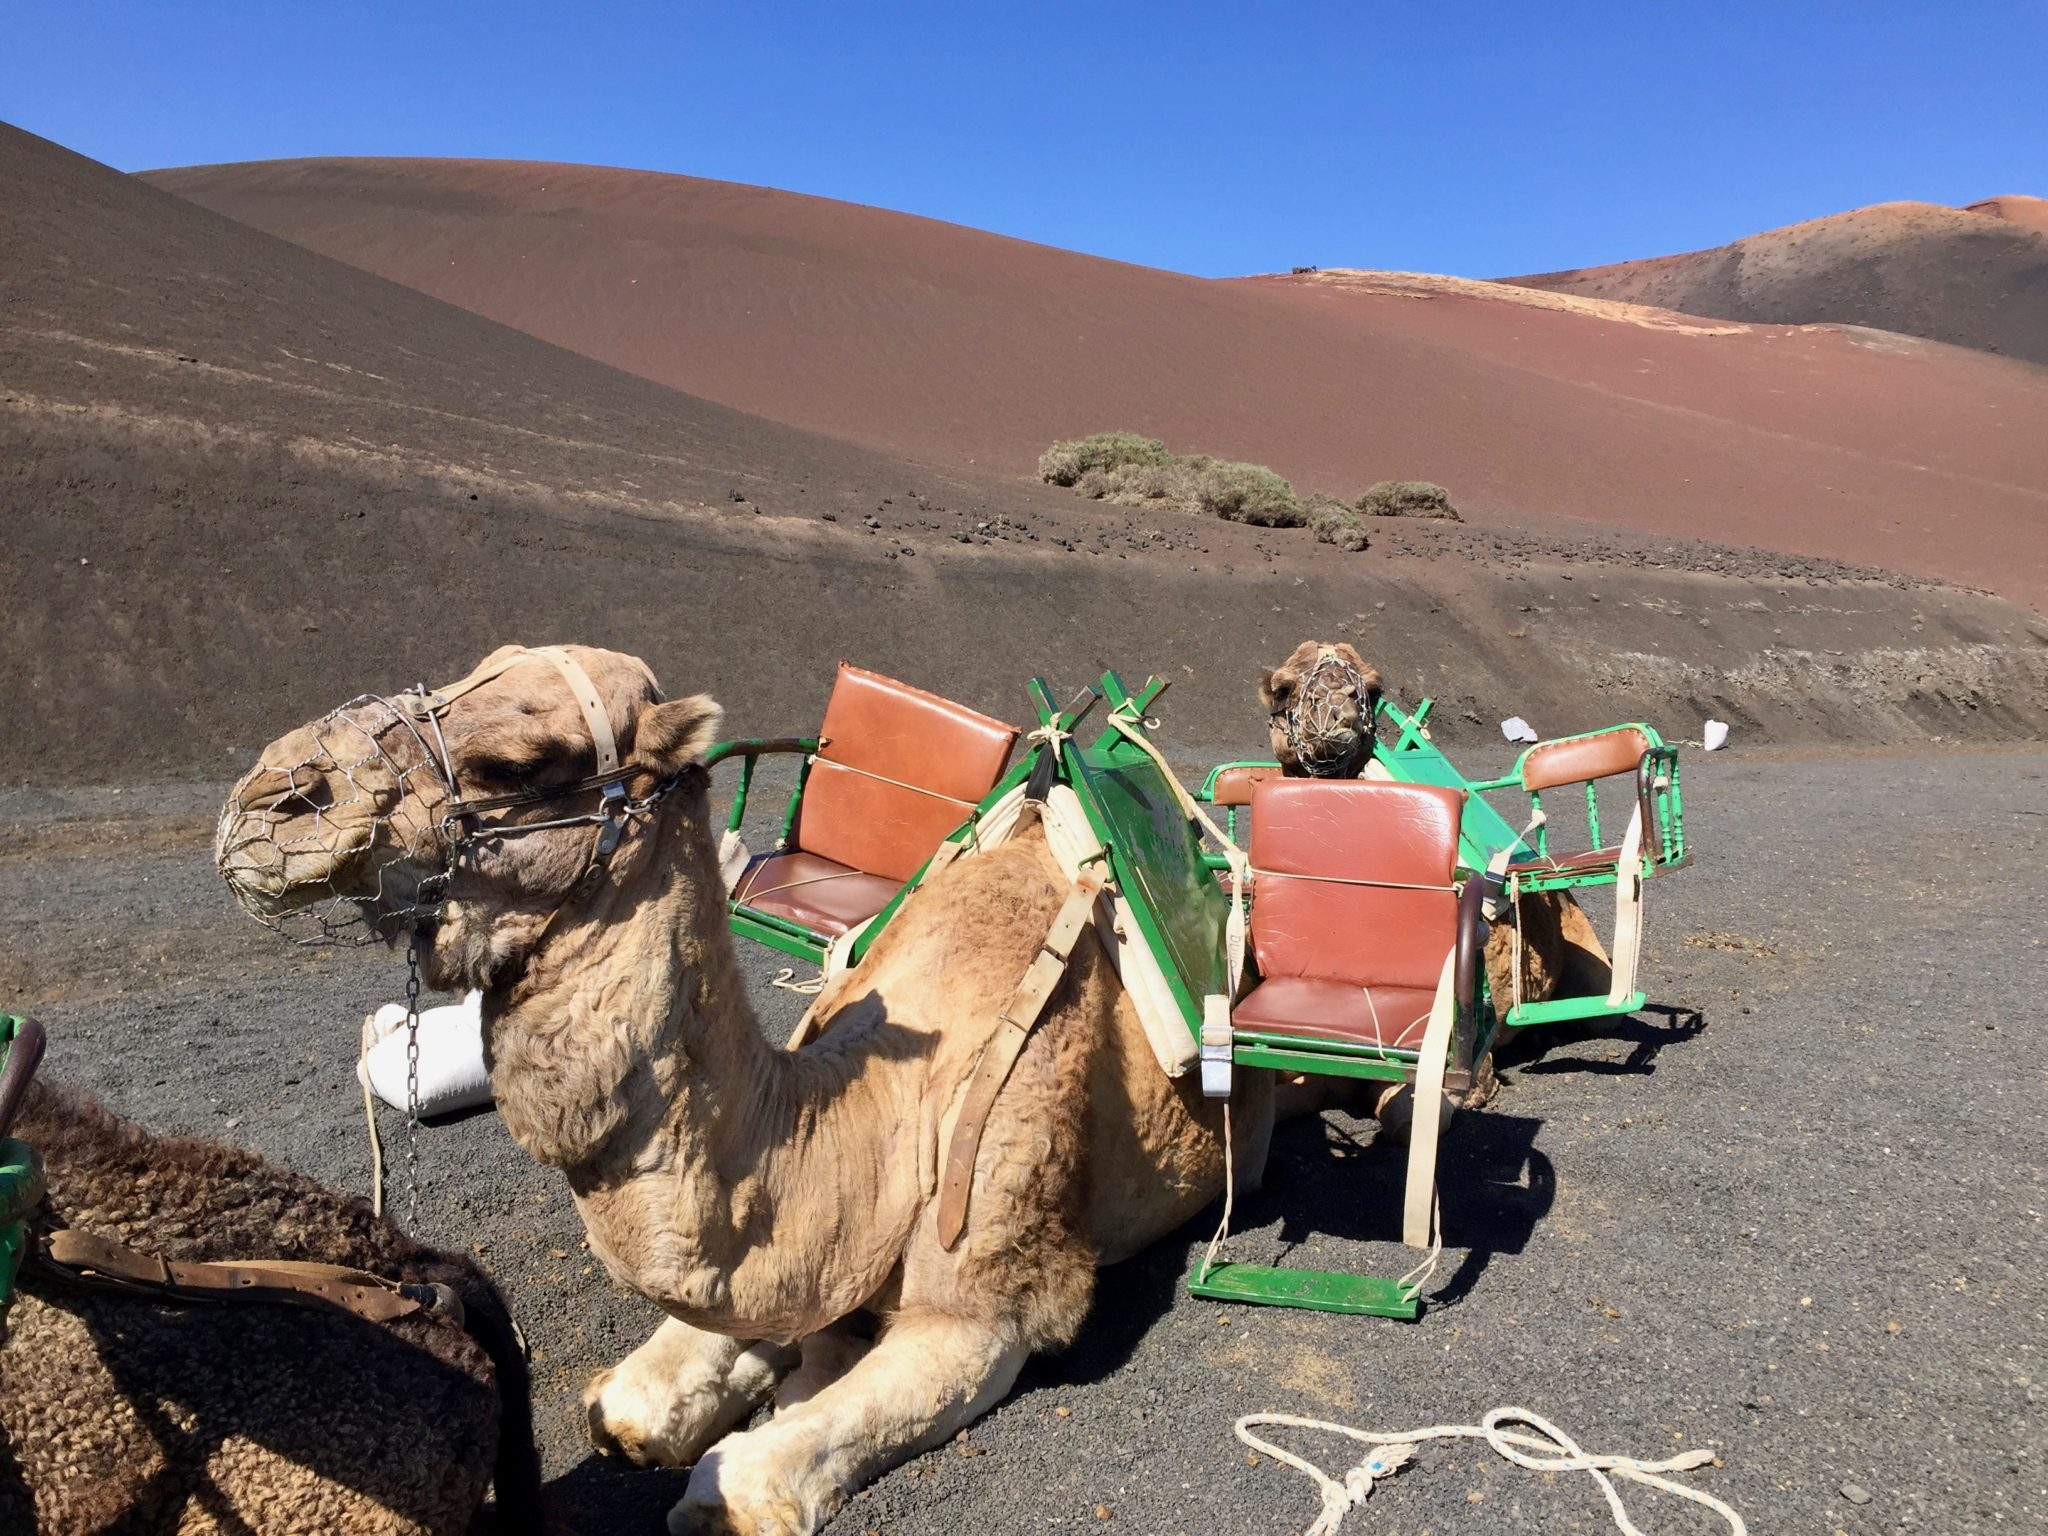 Returning to Lanzarote